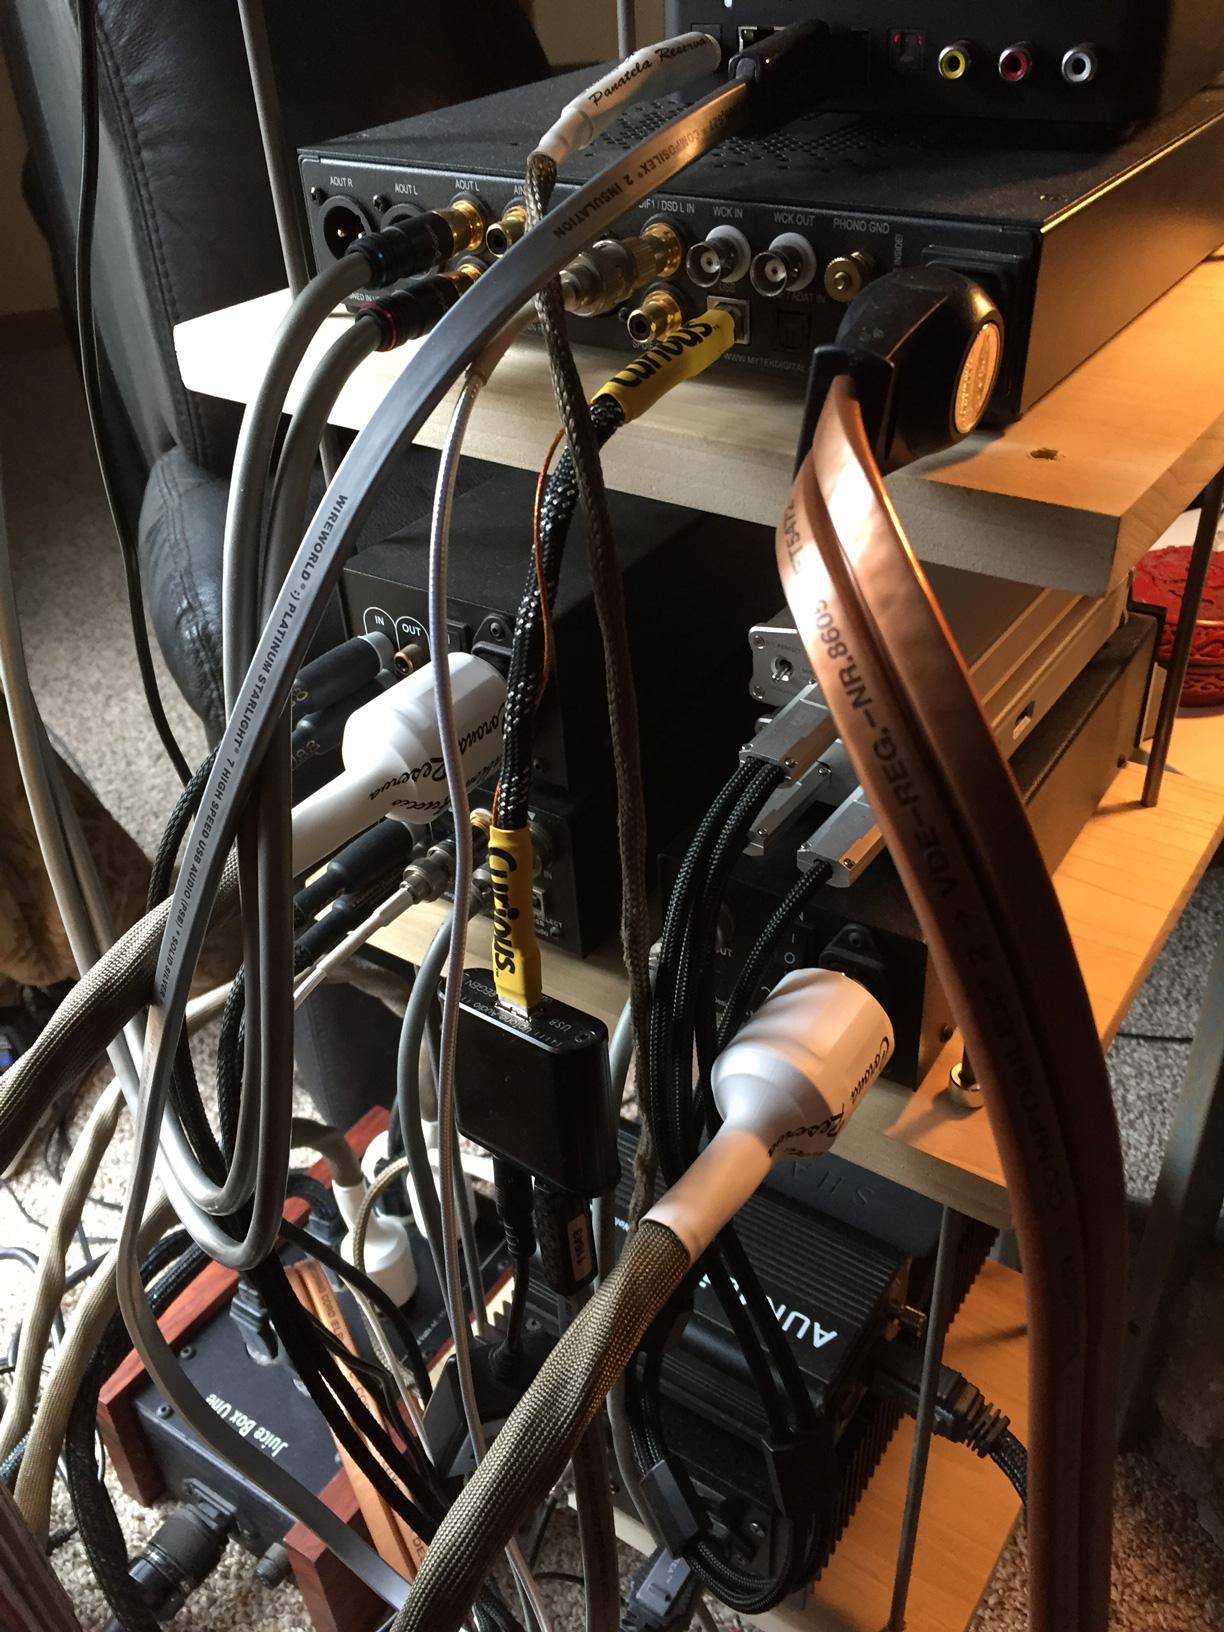 Focal ELEAR, Wireworld, Double Helix, Moon Audio, Schiit Audio